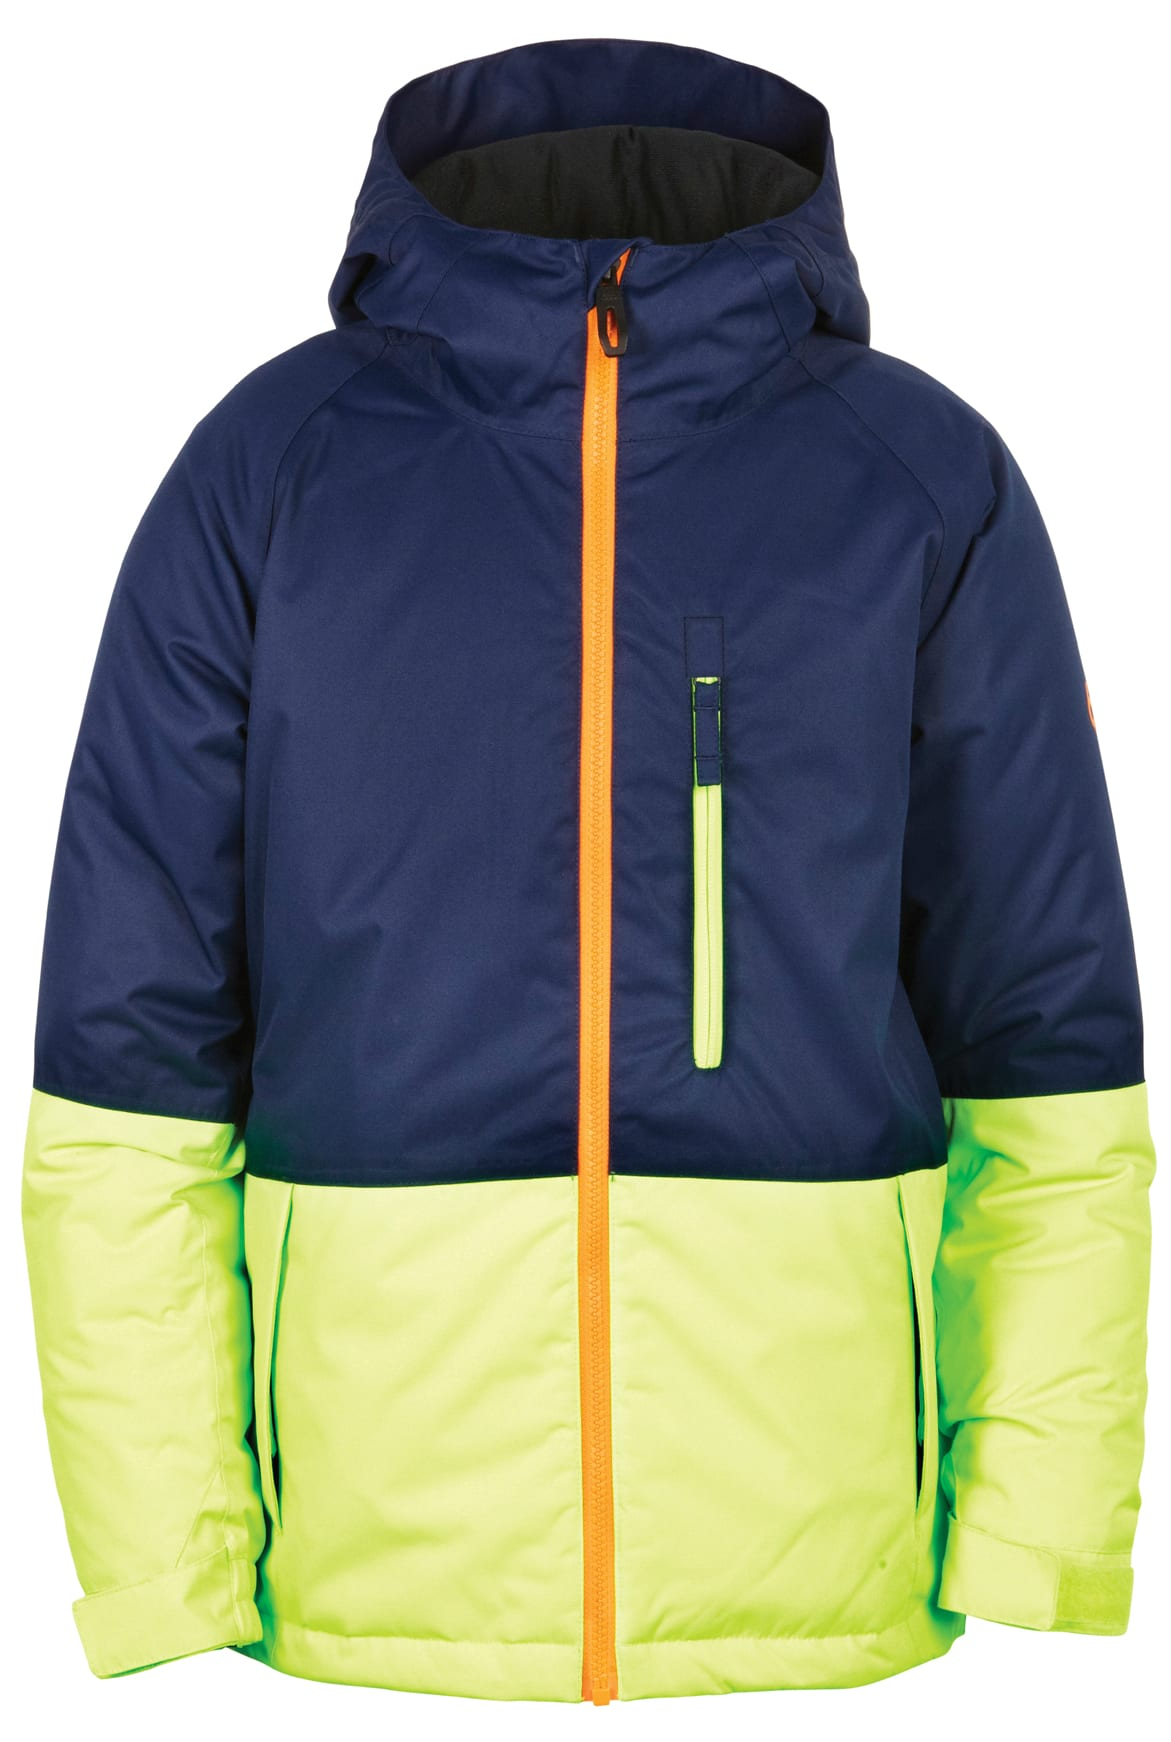 686 Jinx Snowboard Jacket - Kids